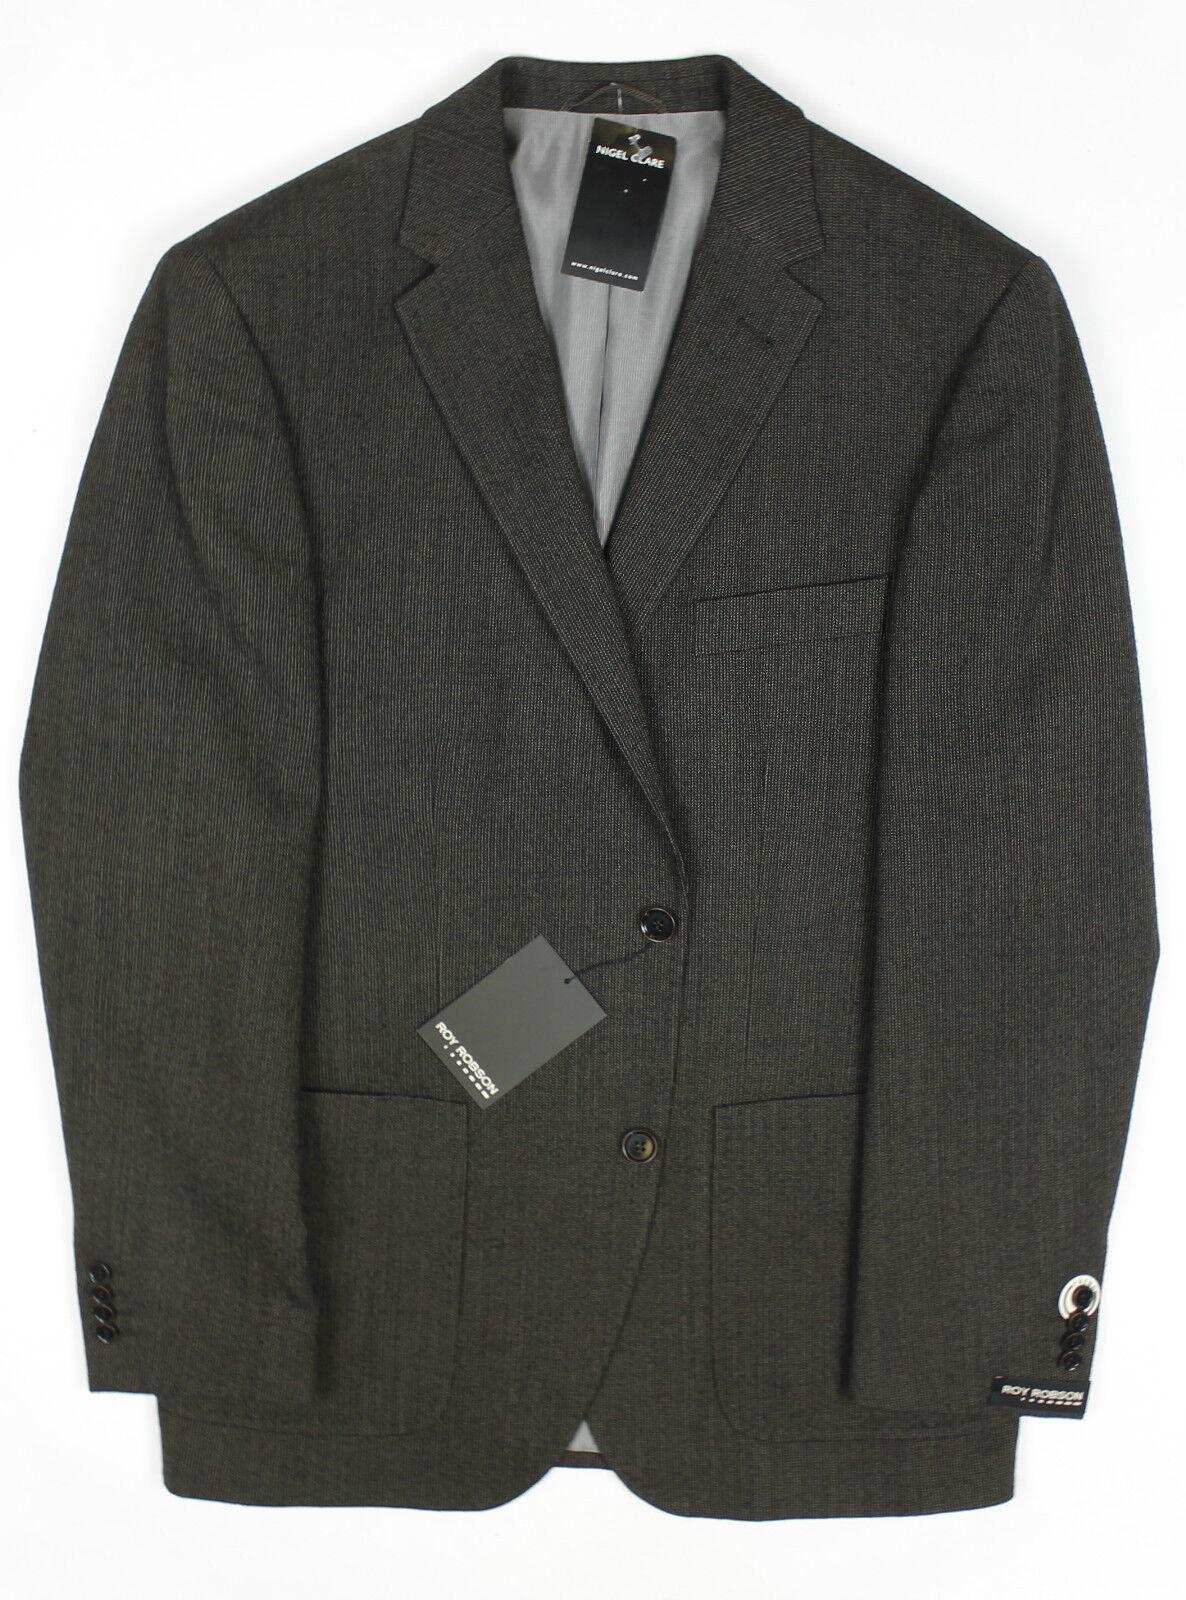 Roy Robson - Braun Pure New Wool Blazer - Größe 40 - NEW WITH TAGS